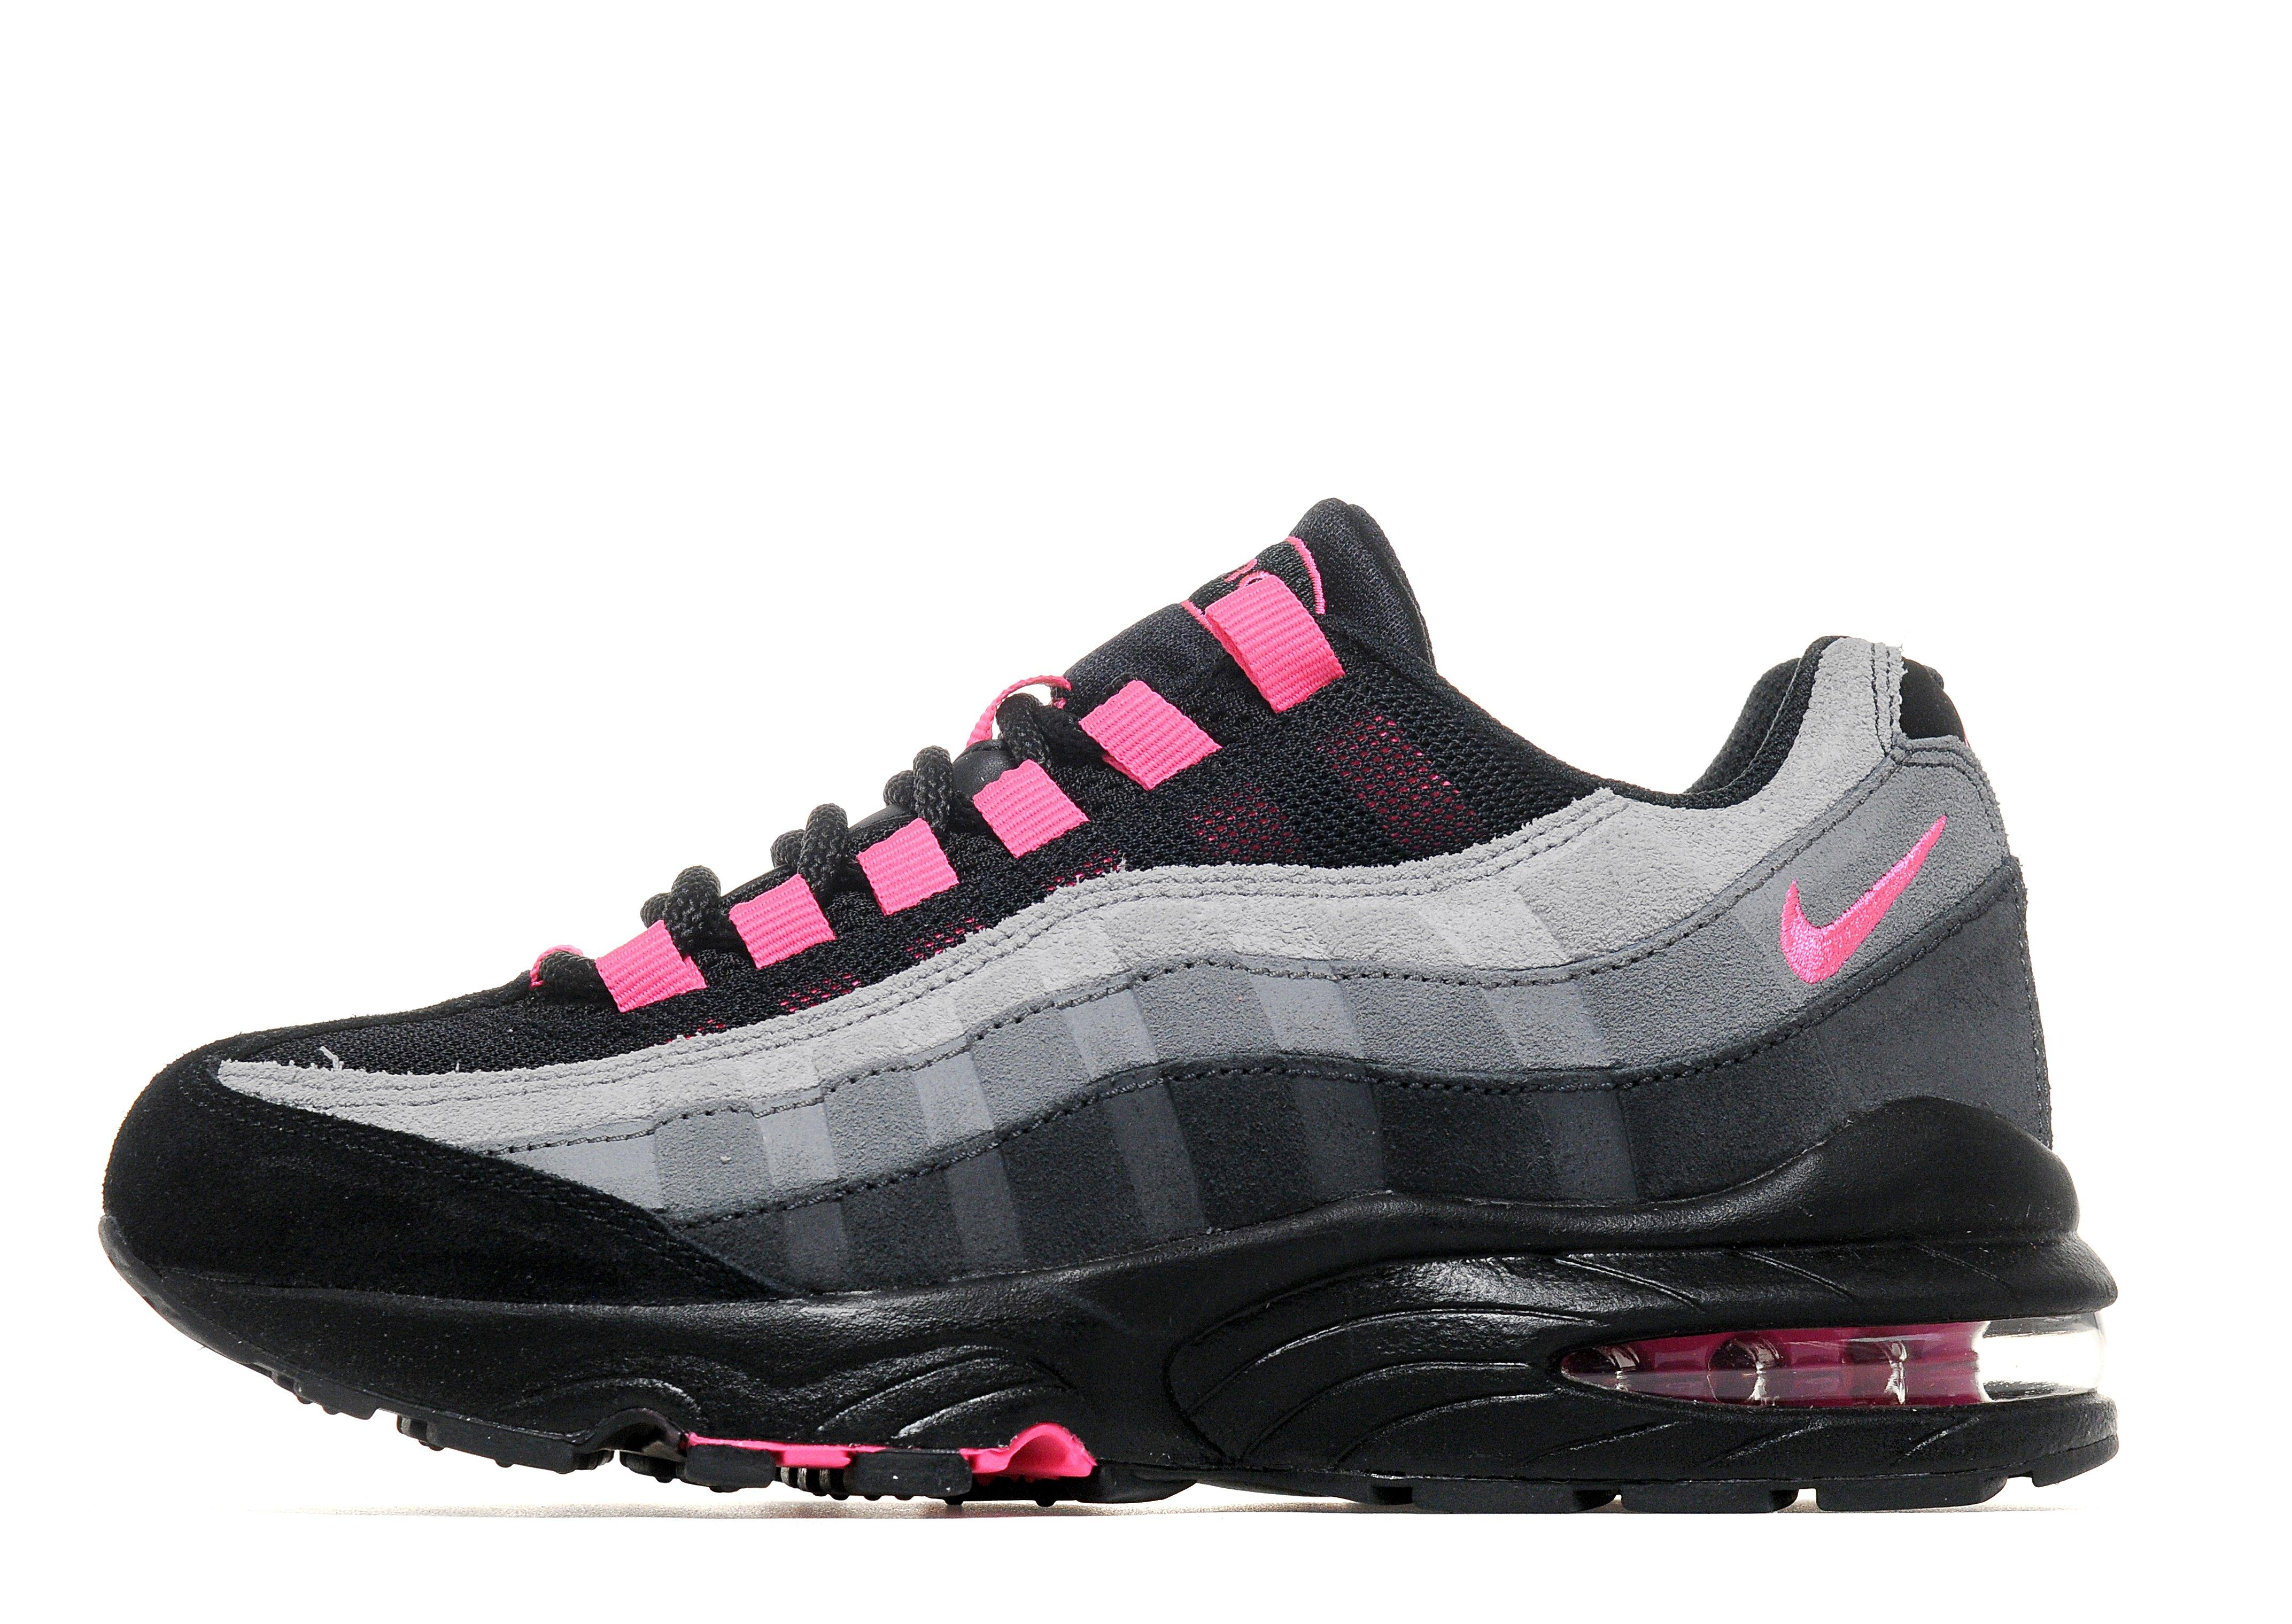 Air Max 95 Pink And Black